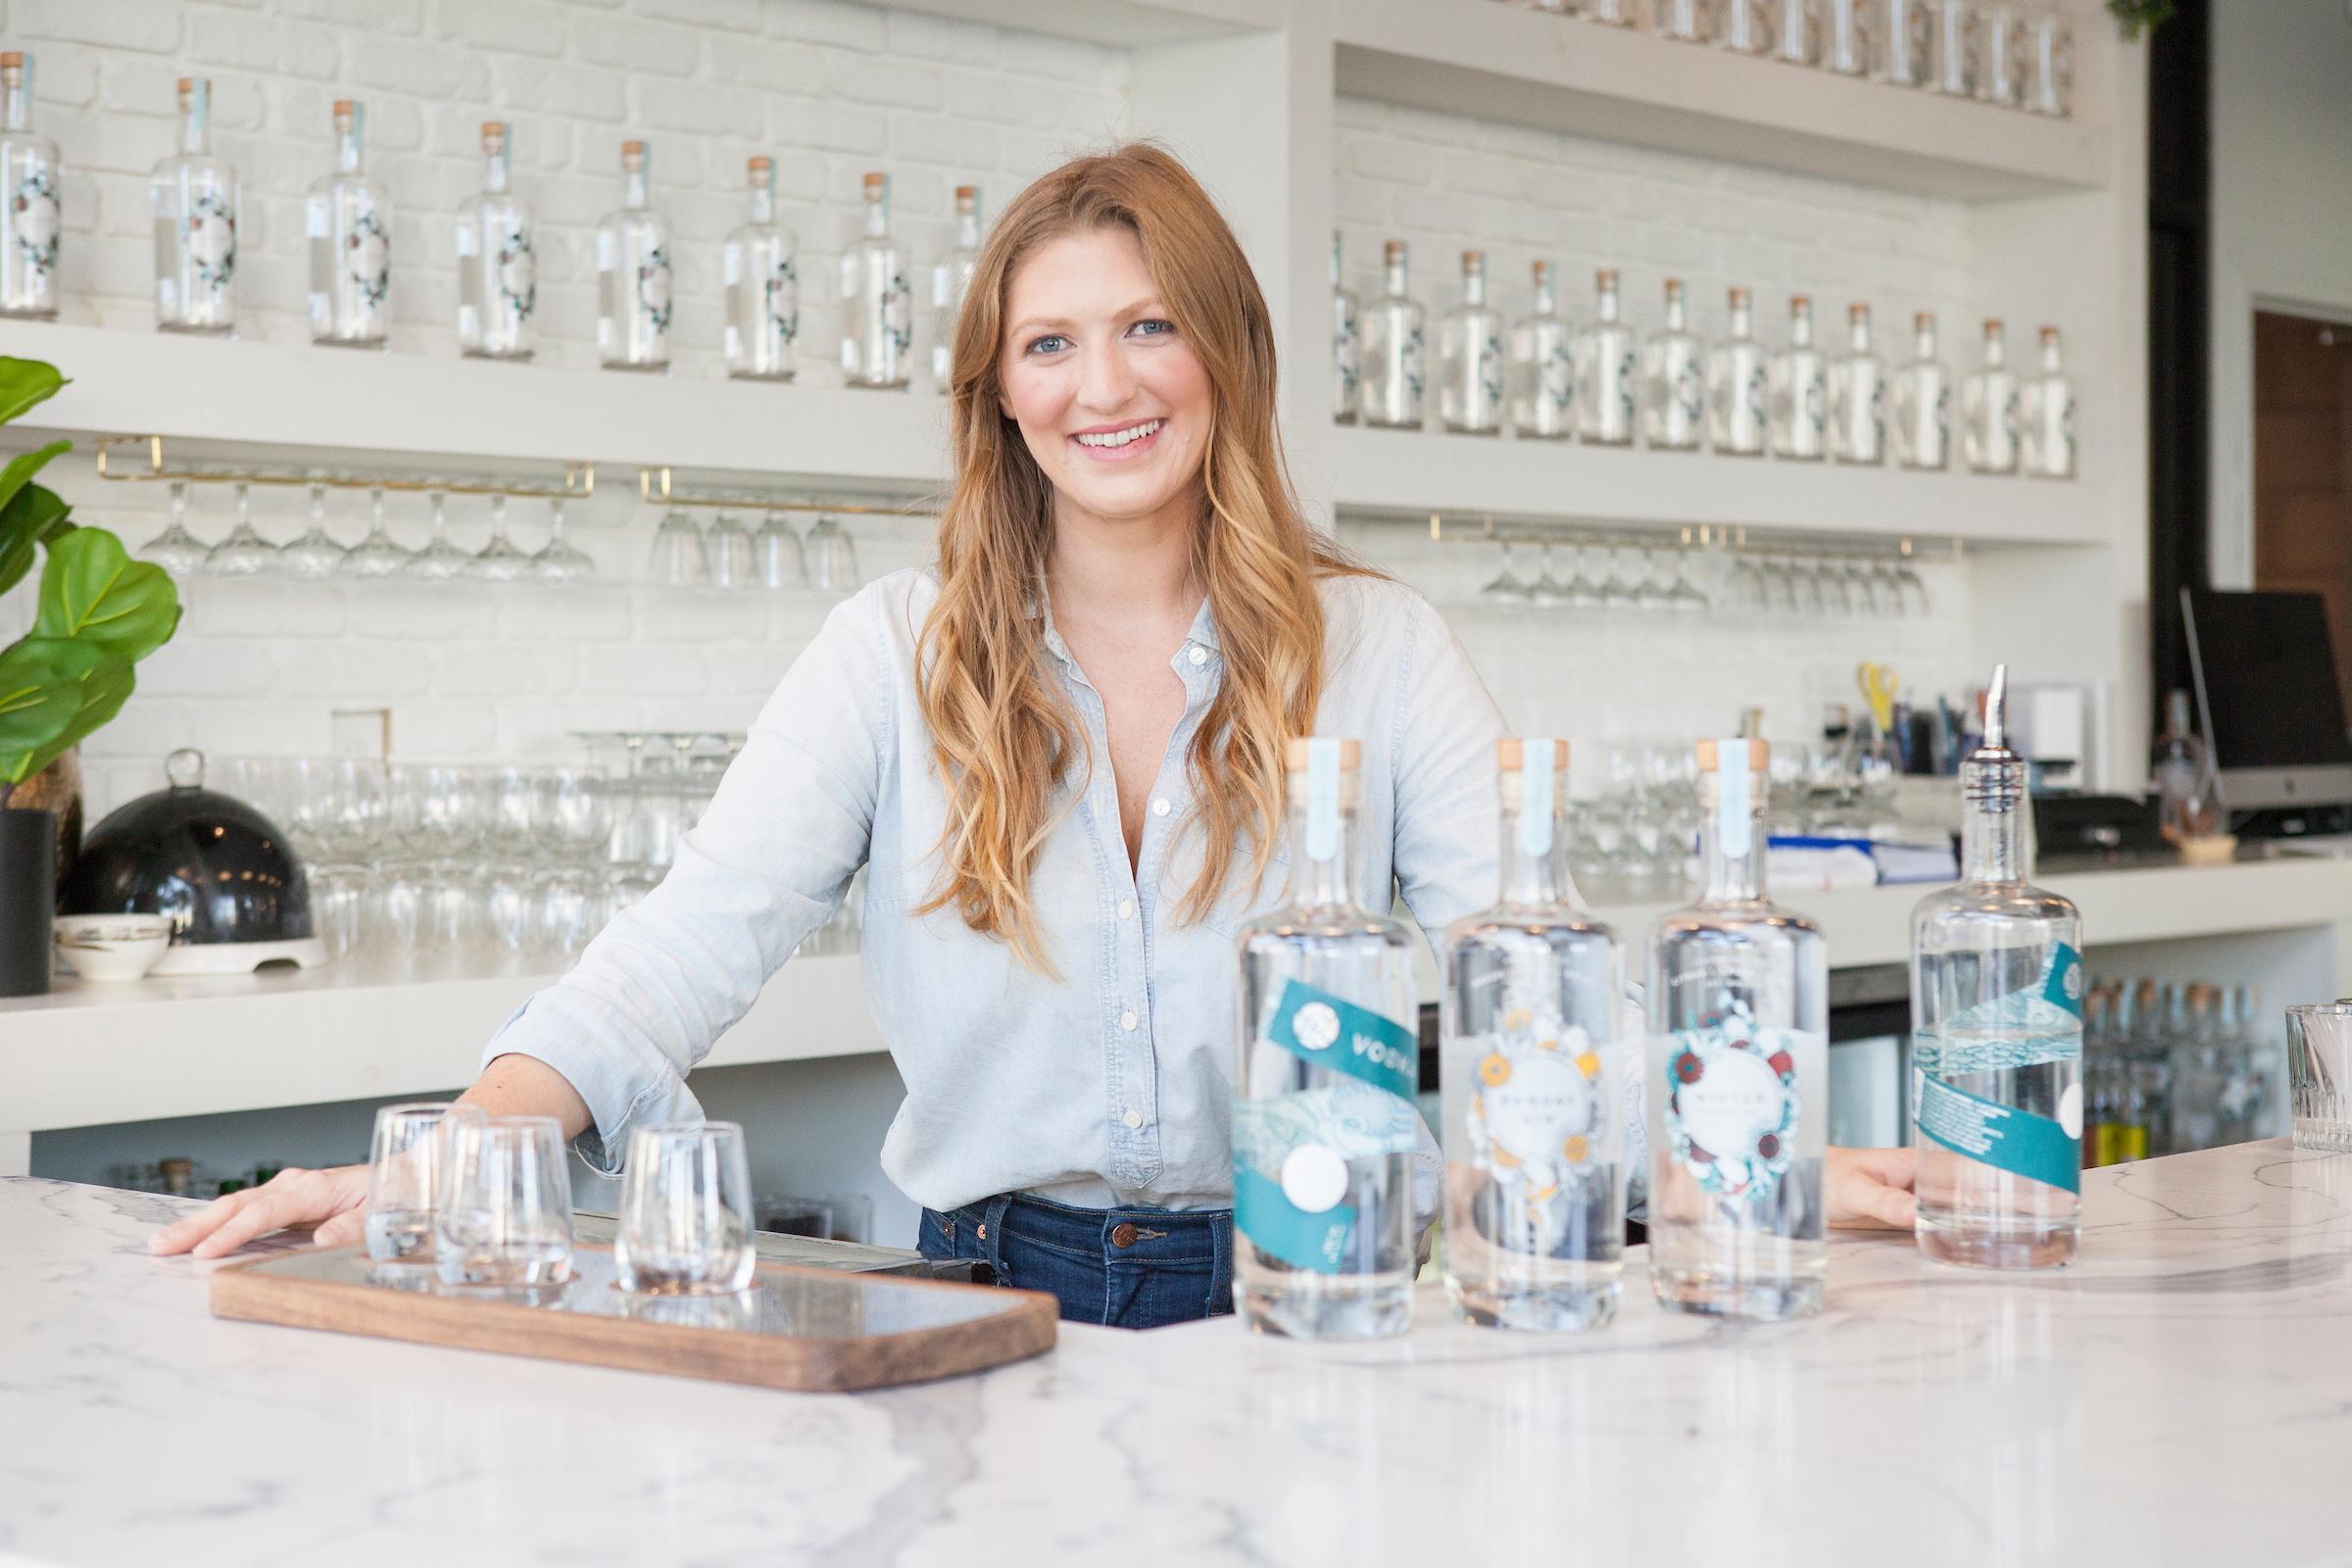 Laura Johnson; Distiller & Founder @ You & Yours Distilling Co.